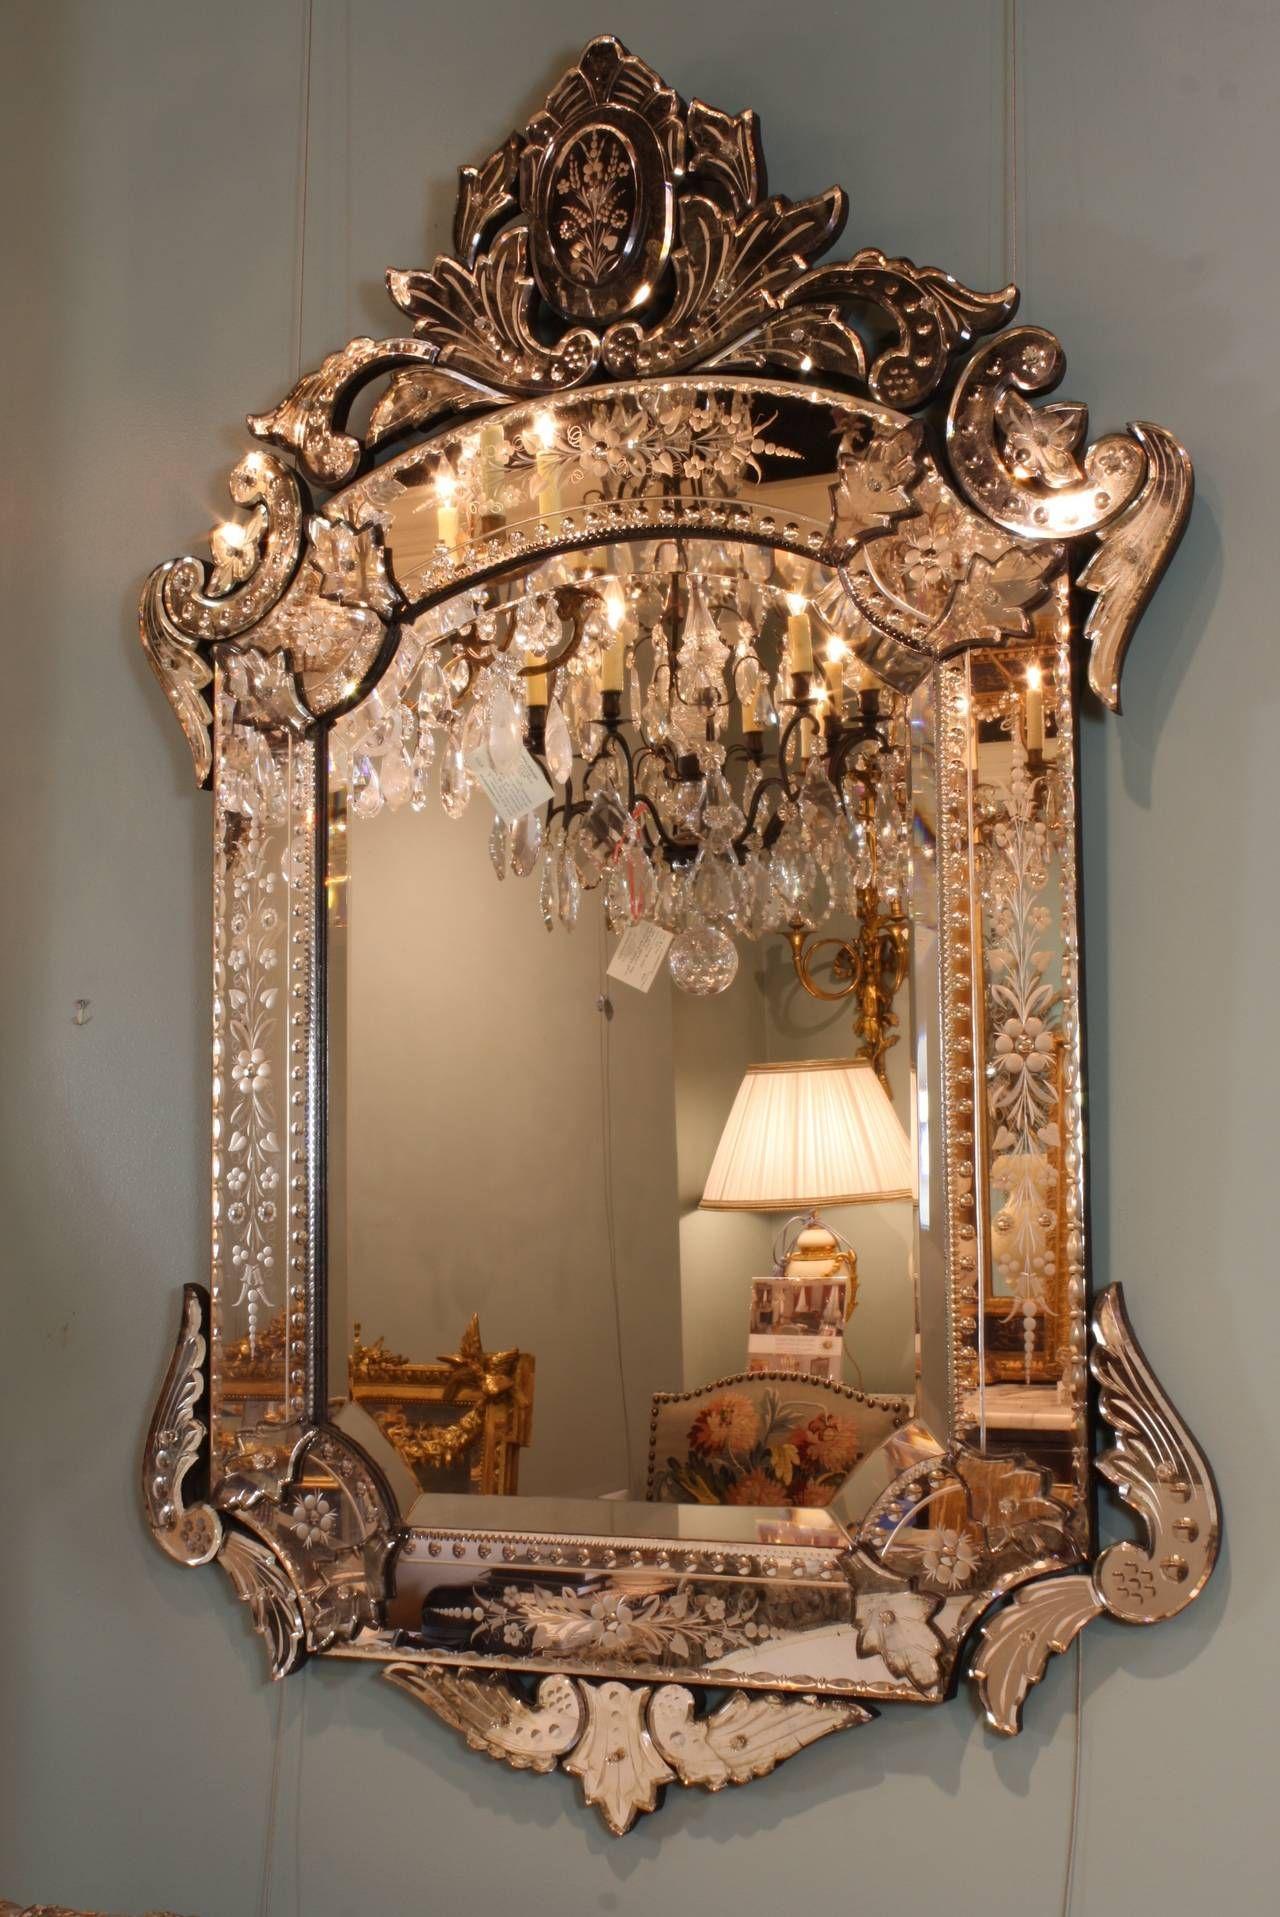 Ornate Venetian Rococo Mirror Design Spiegel Wande